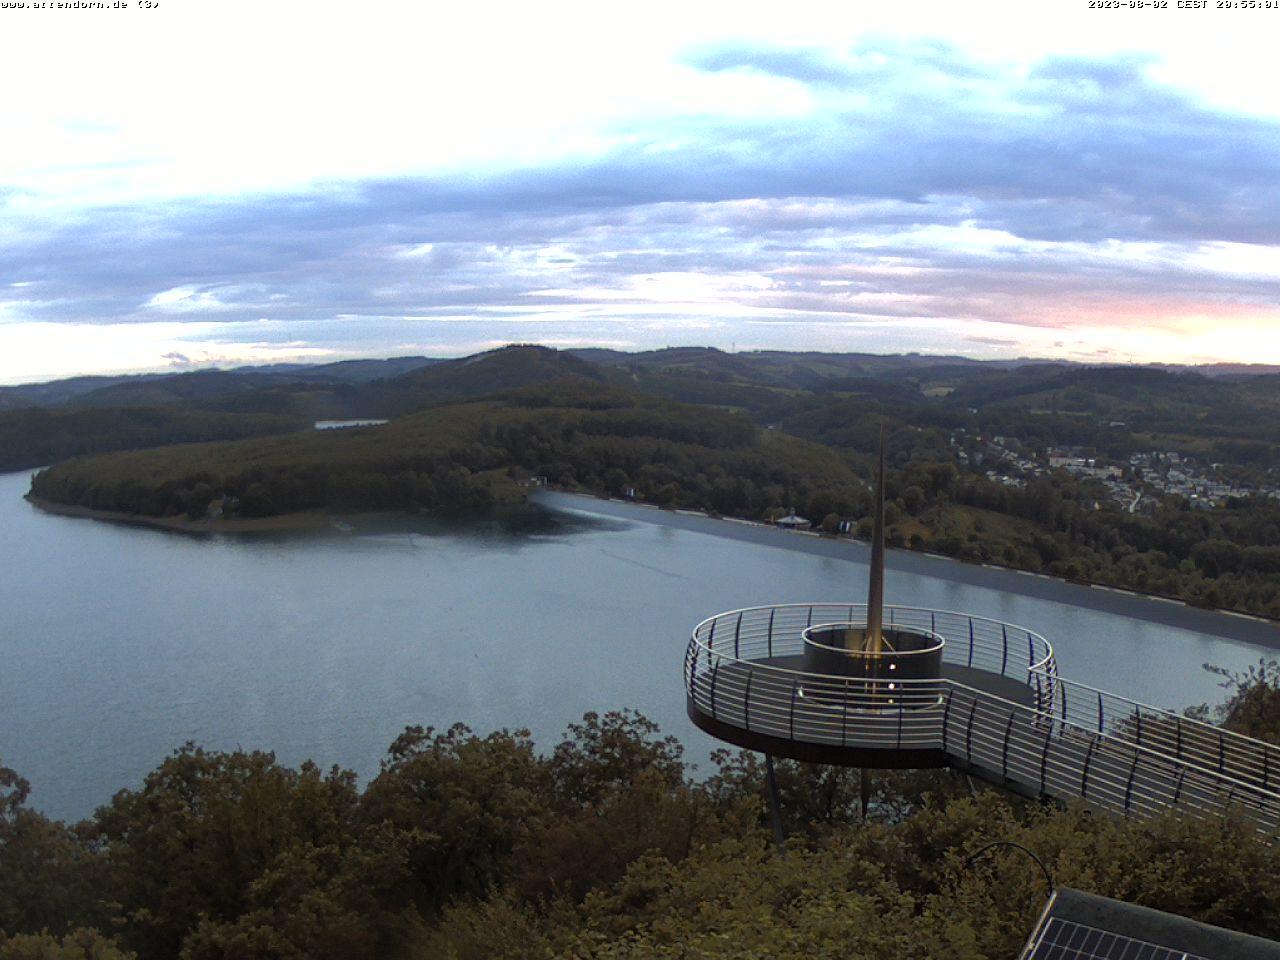 Webcam Biggeblick - Biggesee - Attendorner Geschichten - Stadtmagazin Lokalnachrichten Attendorn